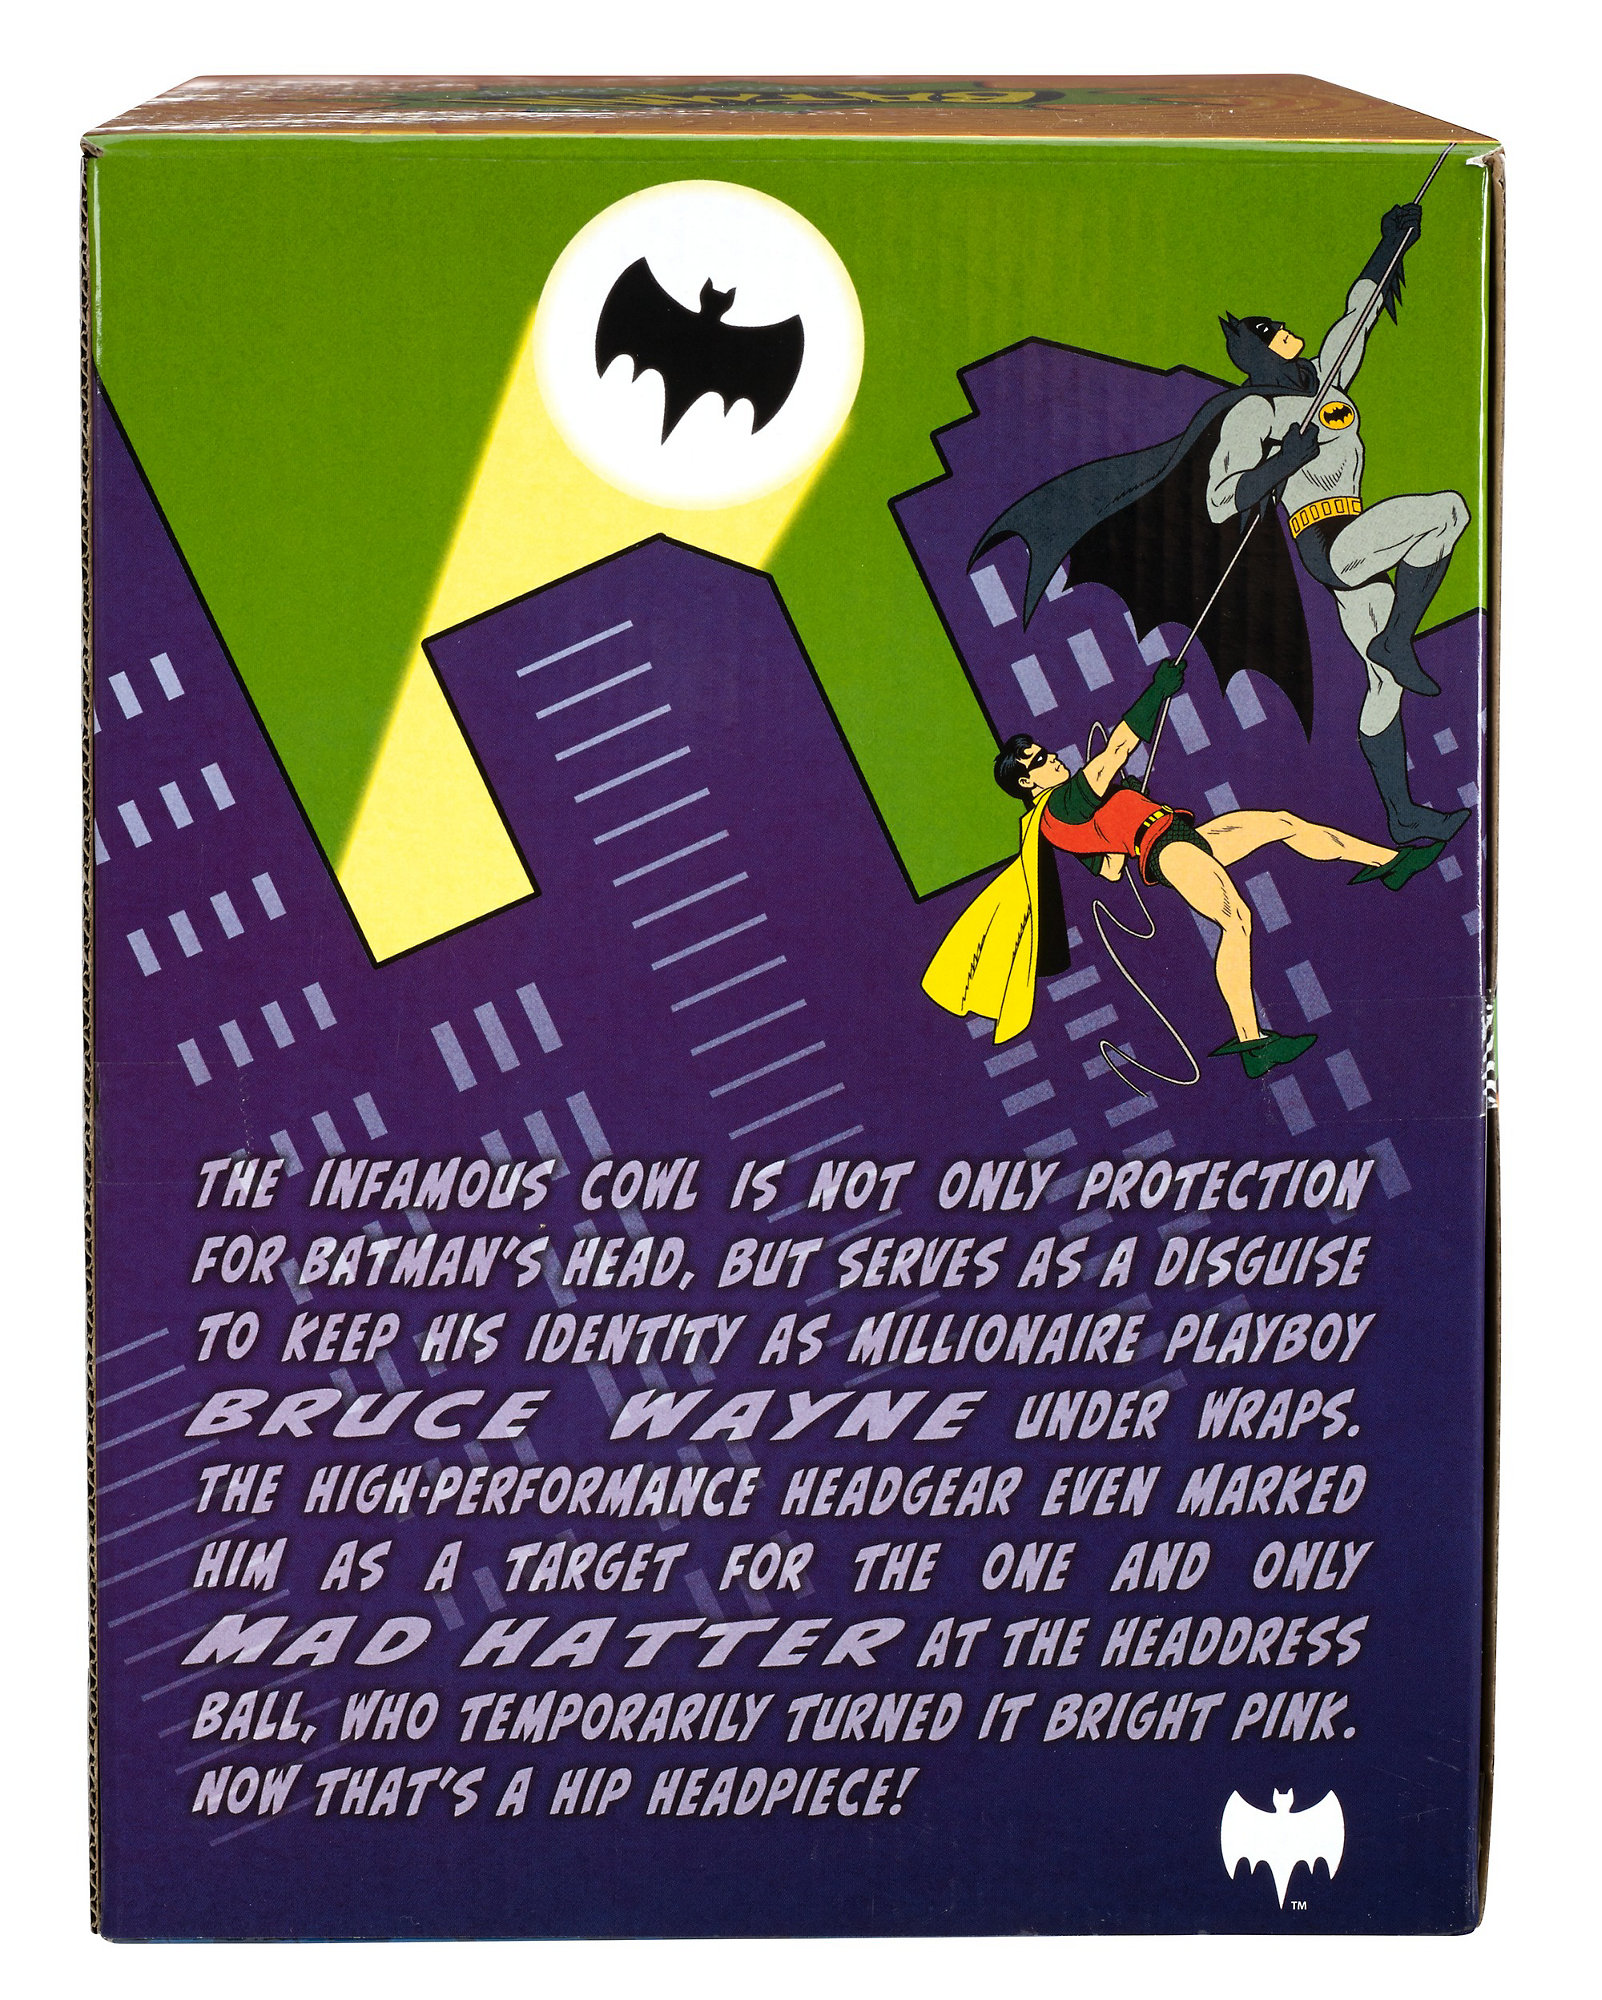 Mattel Batman Prop Replica Cowl Adam West 1966 Classic TV Series Adult Collector